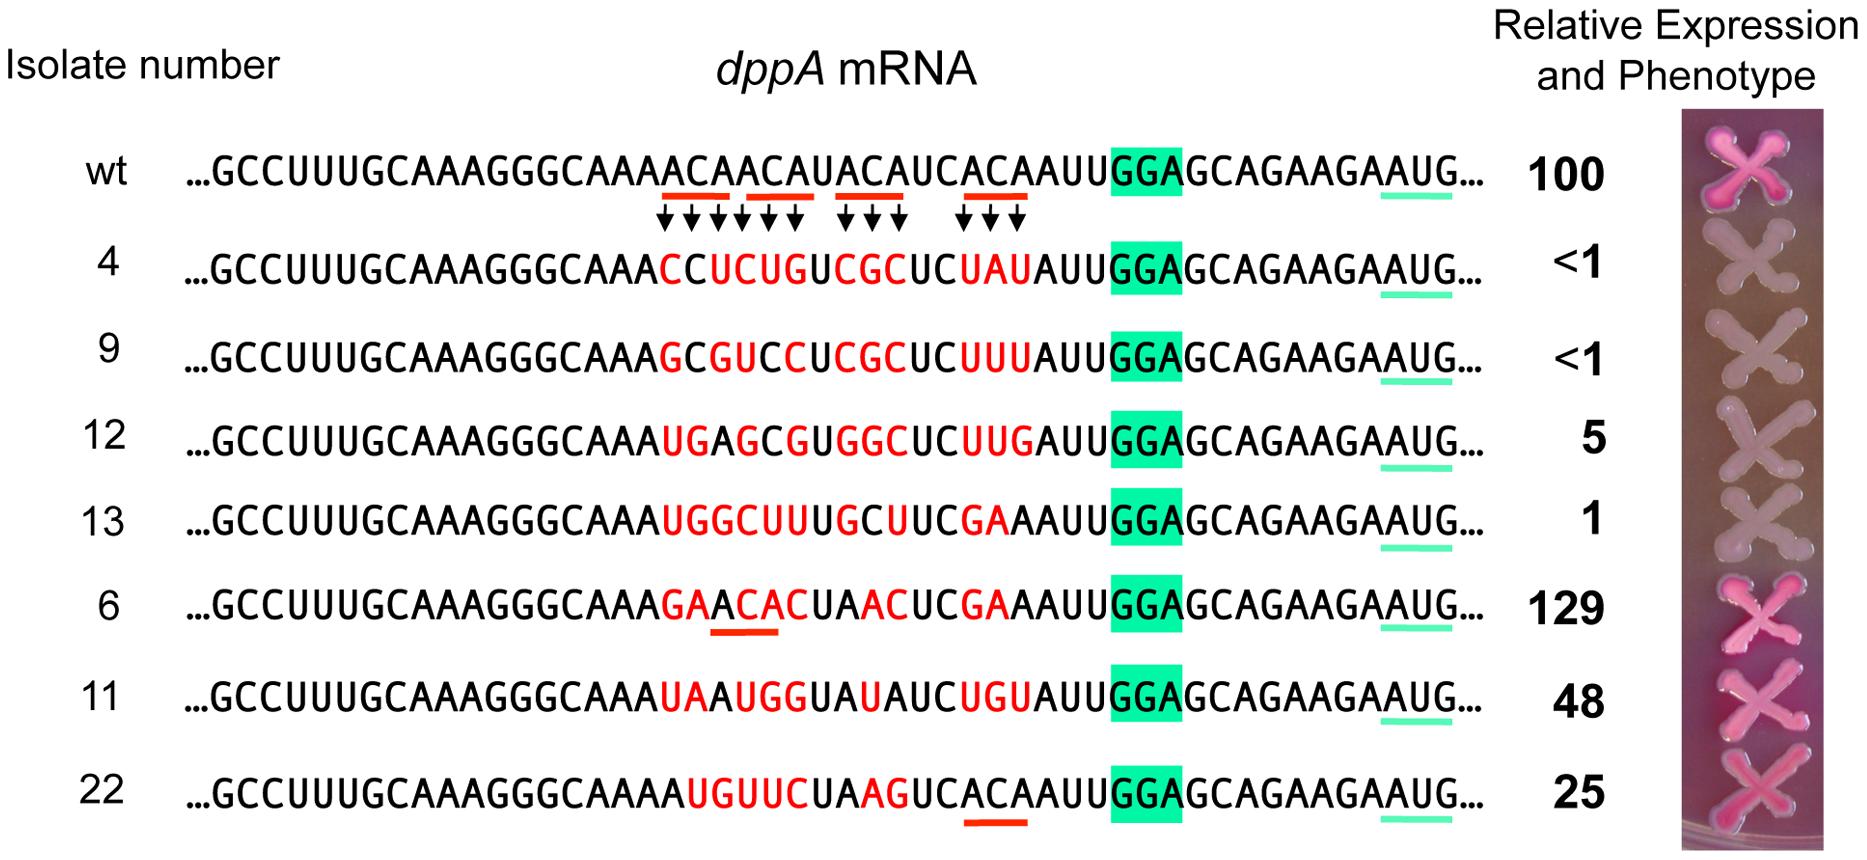 Randomizing ACA motifs in the ribosome binding site of <i>dppA</i> gene.